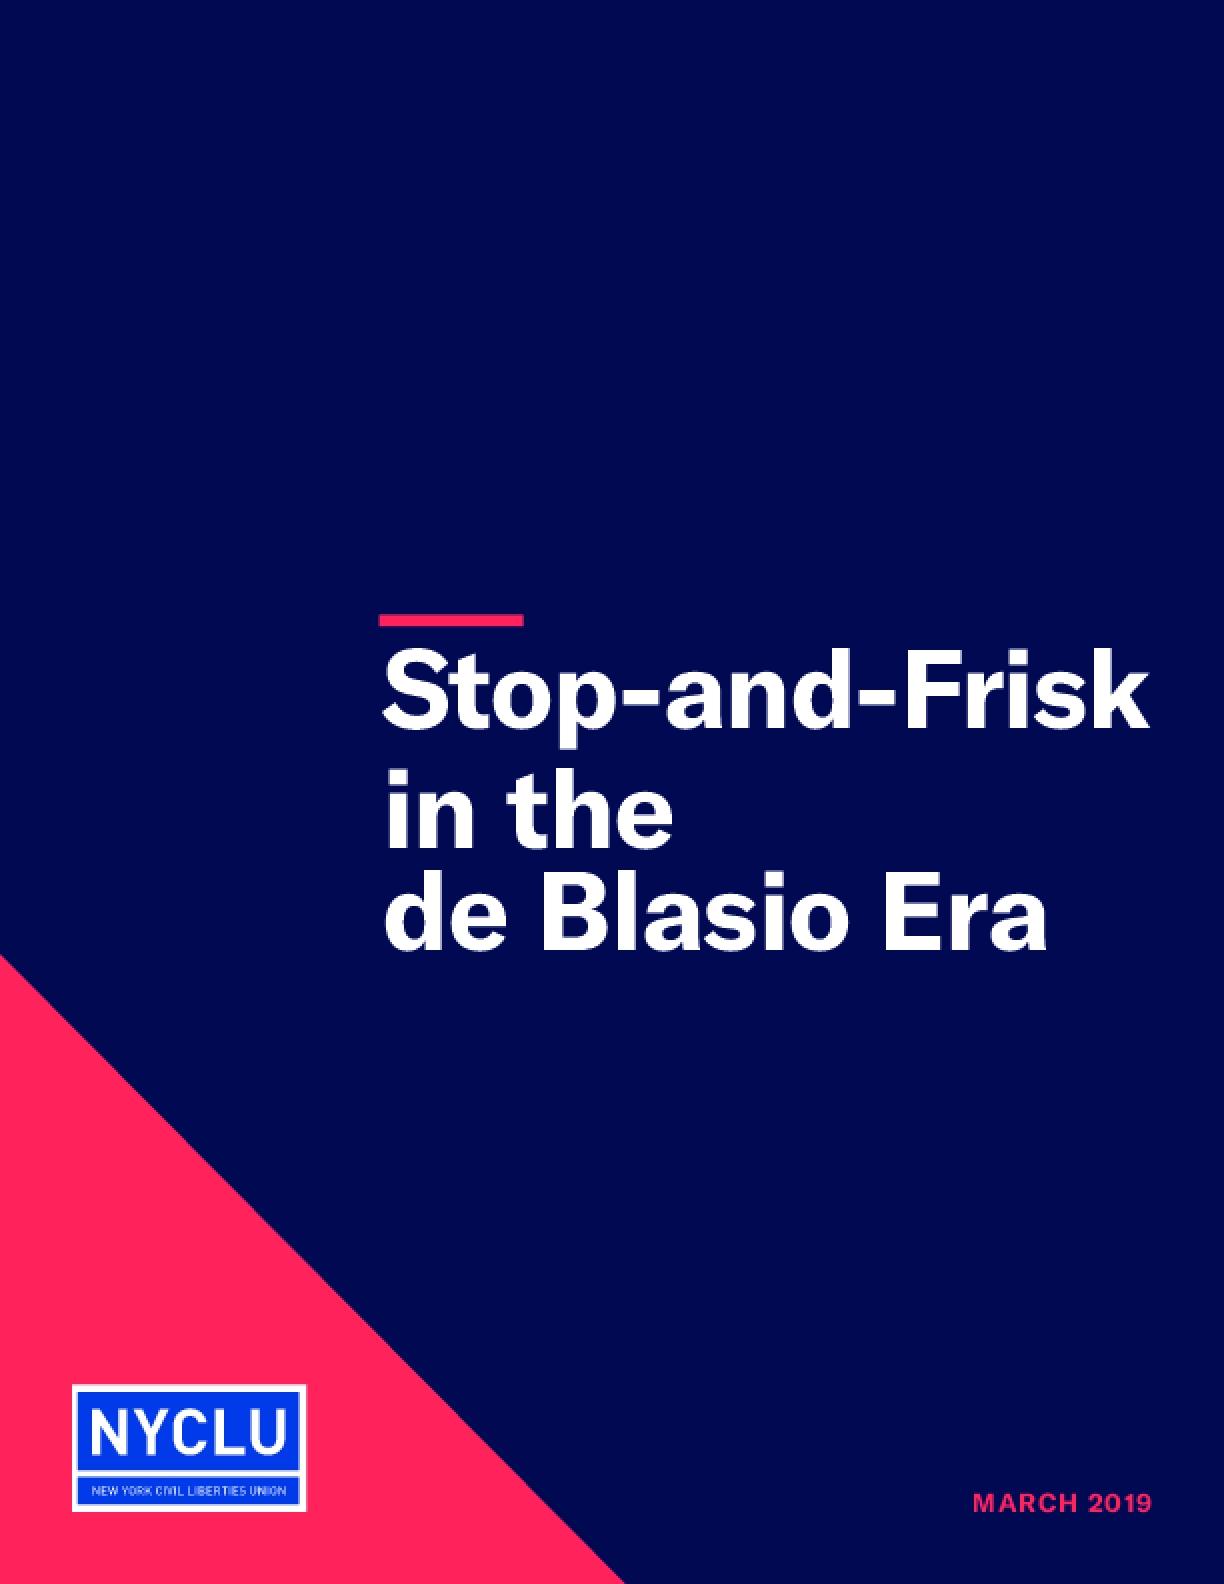 Stop-and-Frisk in the de Blasio Era